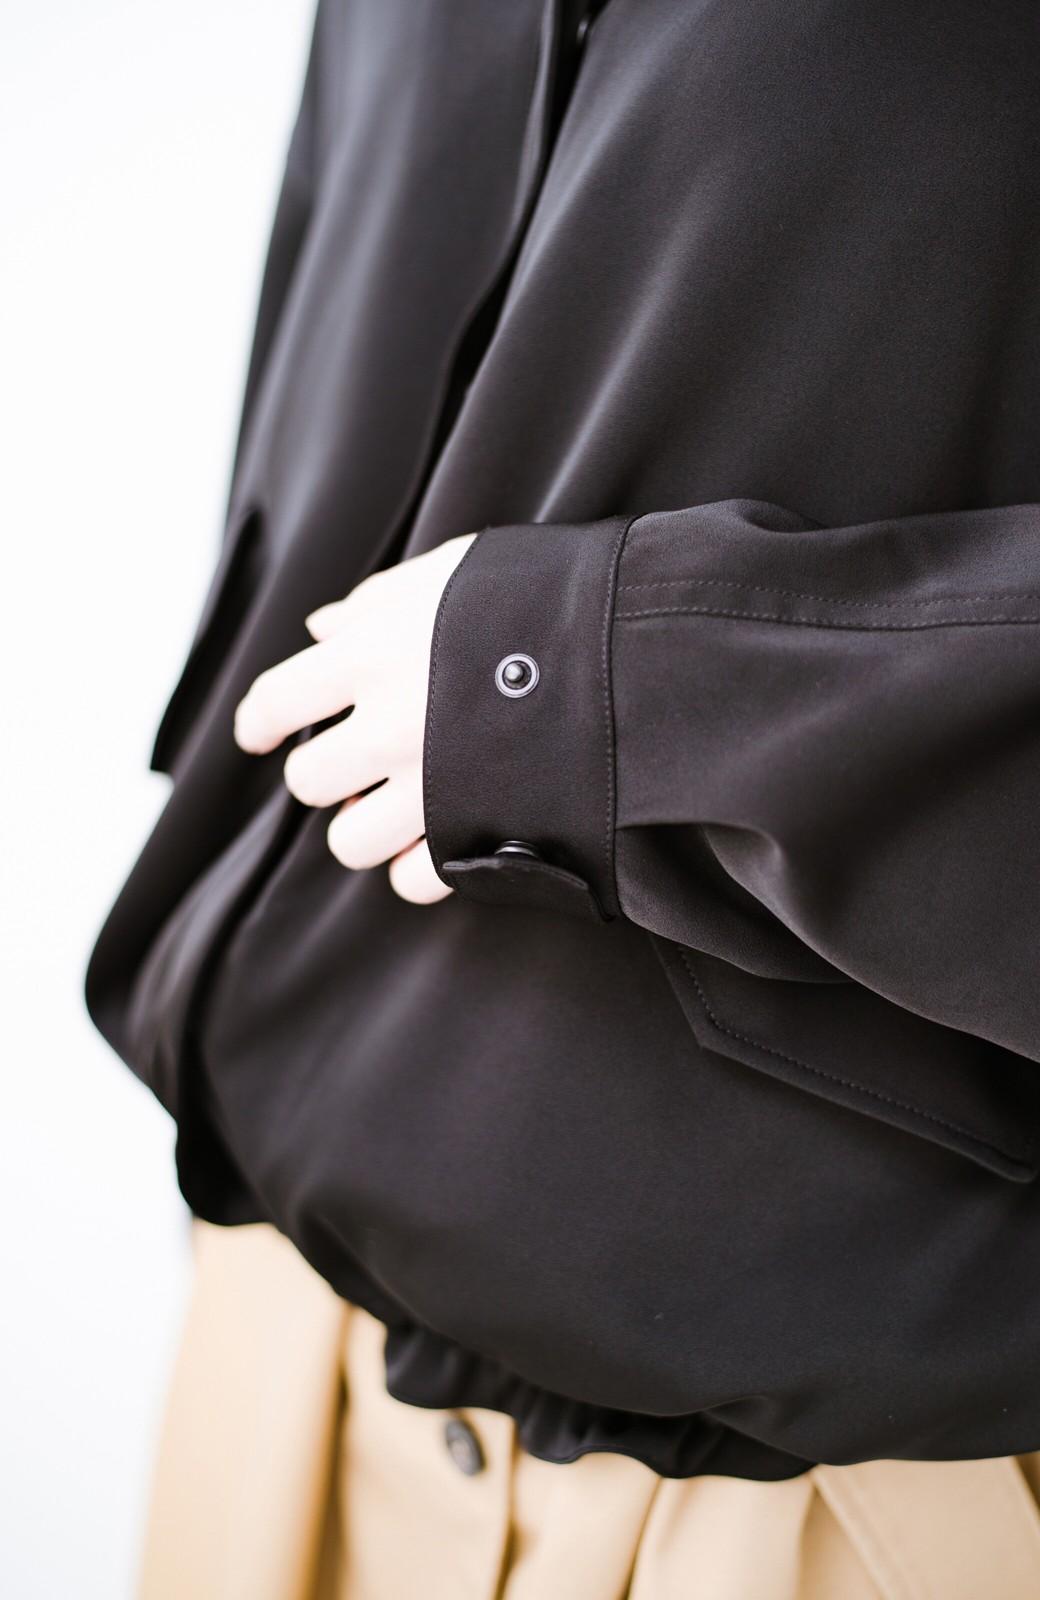 haco! 気軽に羽織ってかっこよくキマるオトナっぽブルゾンbyMAKORI <ブラック>の商品写真5